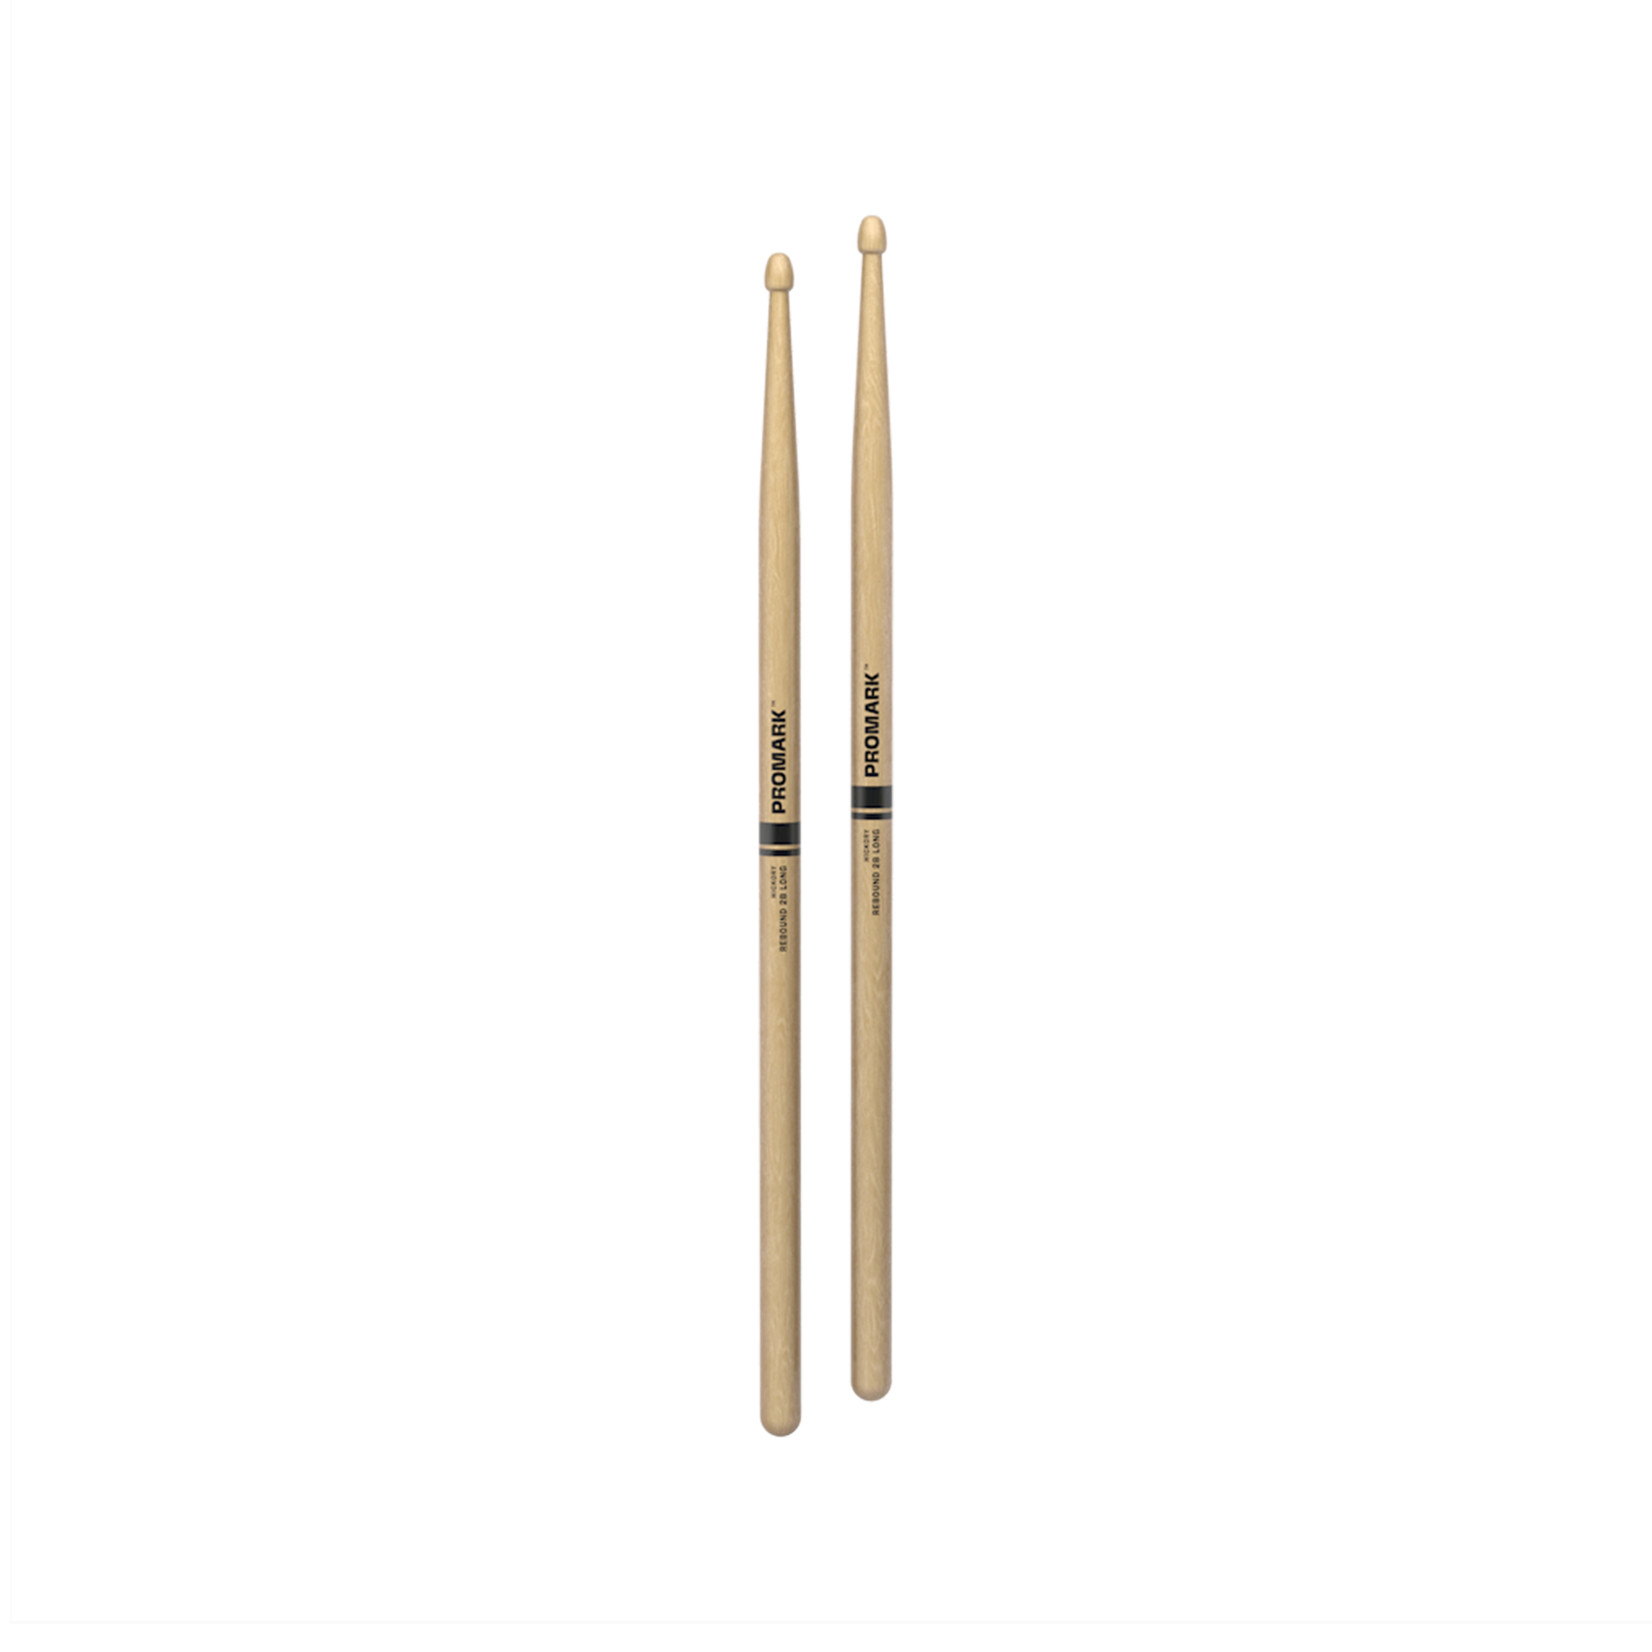 Promark ProMark Rebound 2B Long Hickory Wood Tip Drumstick